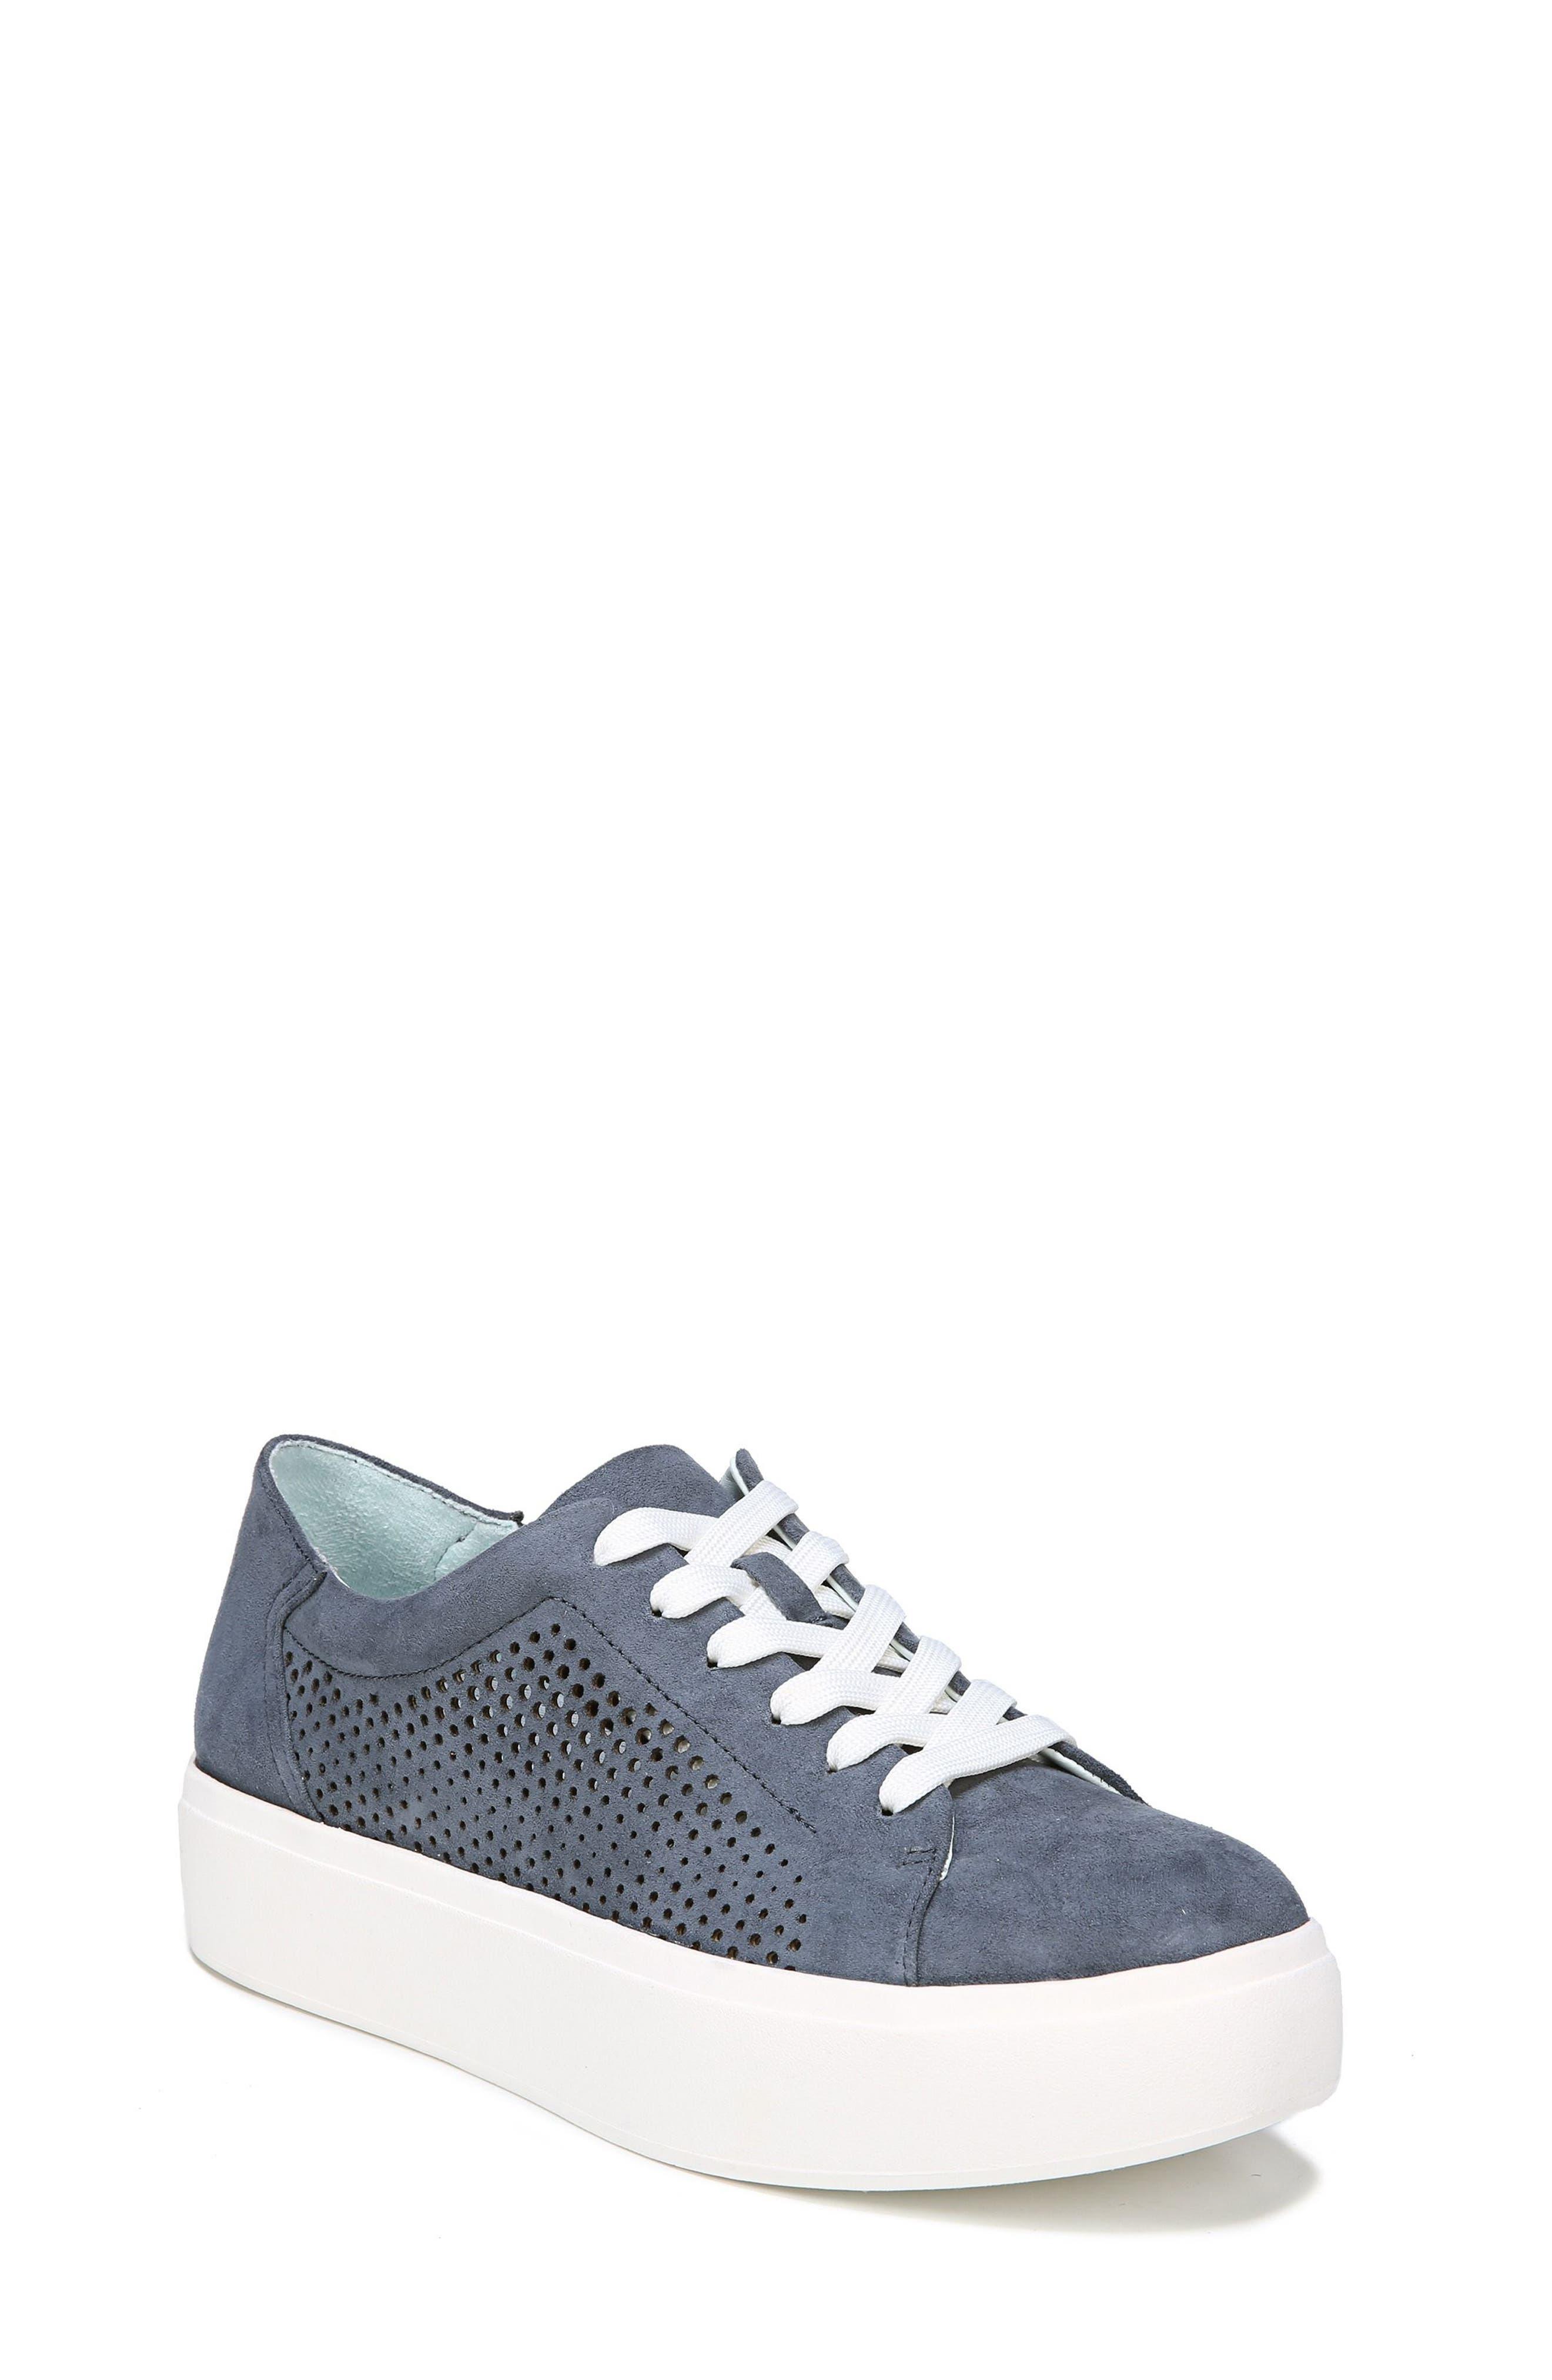 Alternate Image 1 Selected - Dr. Scholl's Kinney Platform Sneaker (Women)